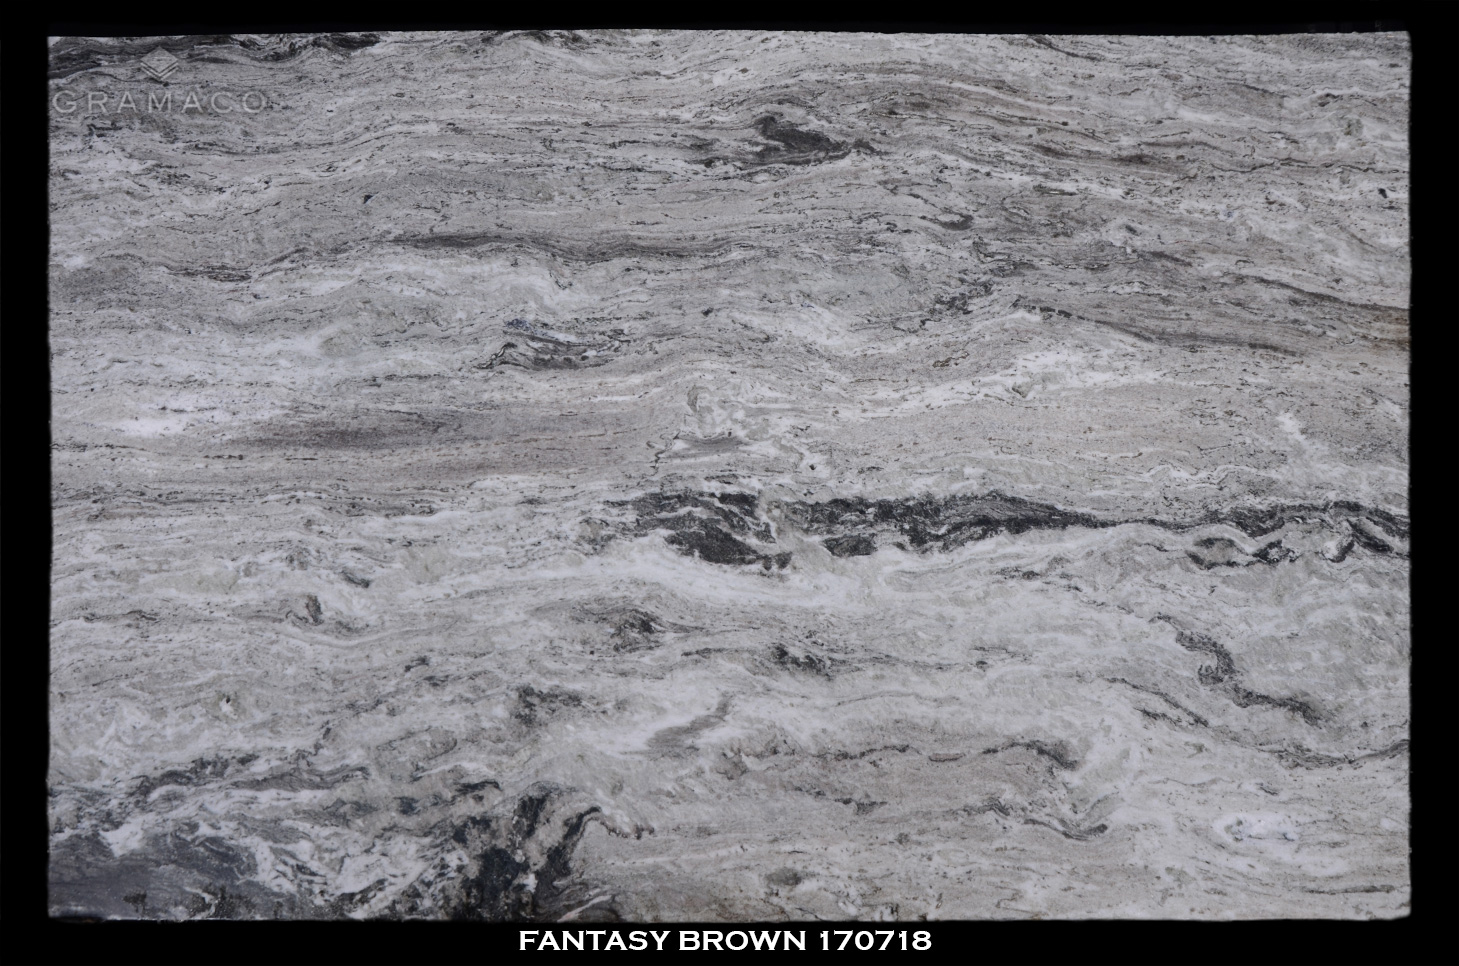 FANTASY-BROWN-170718